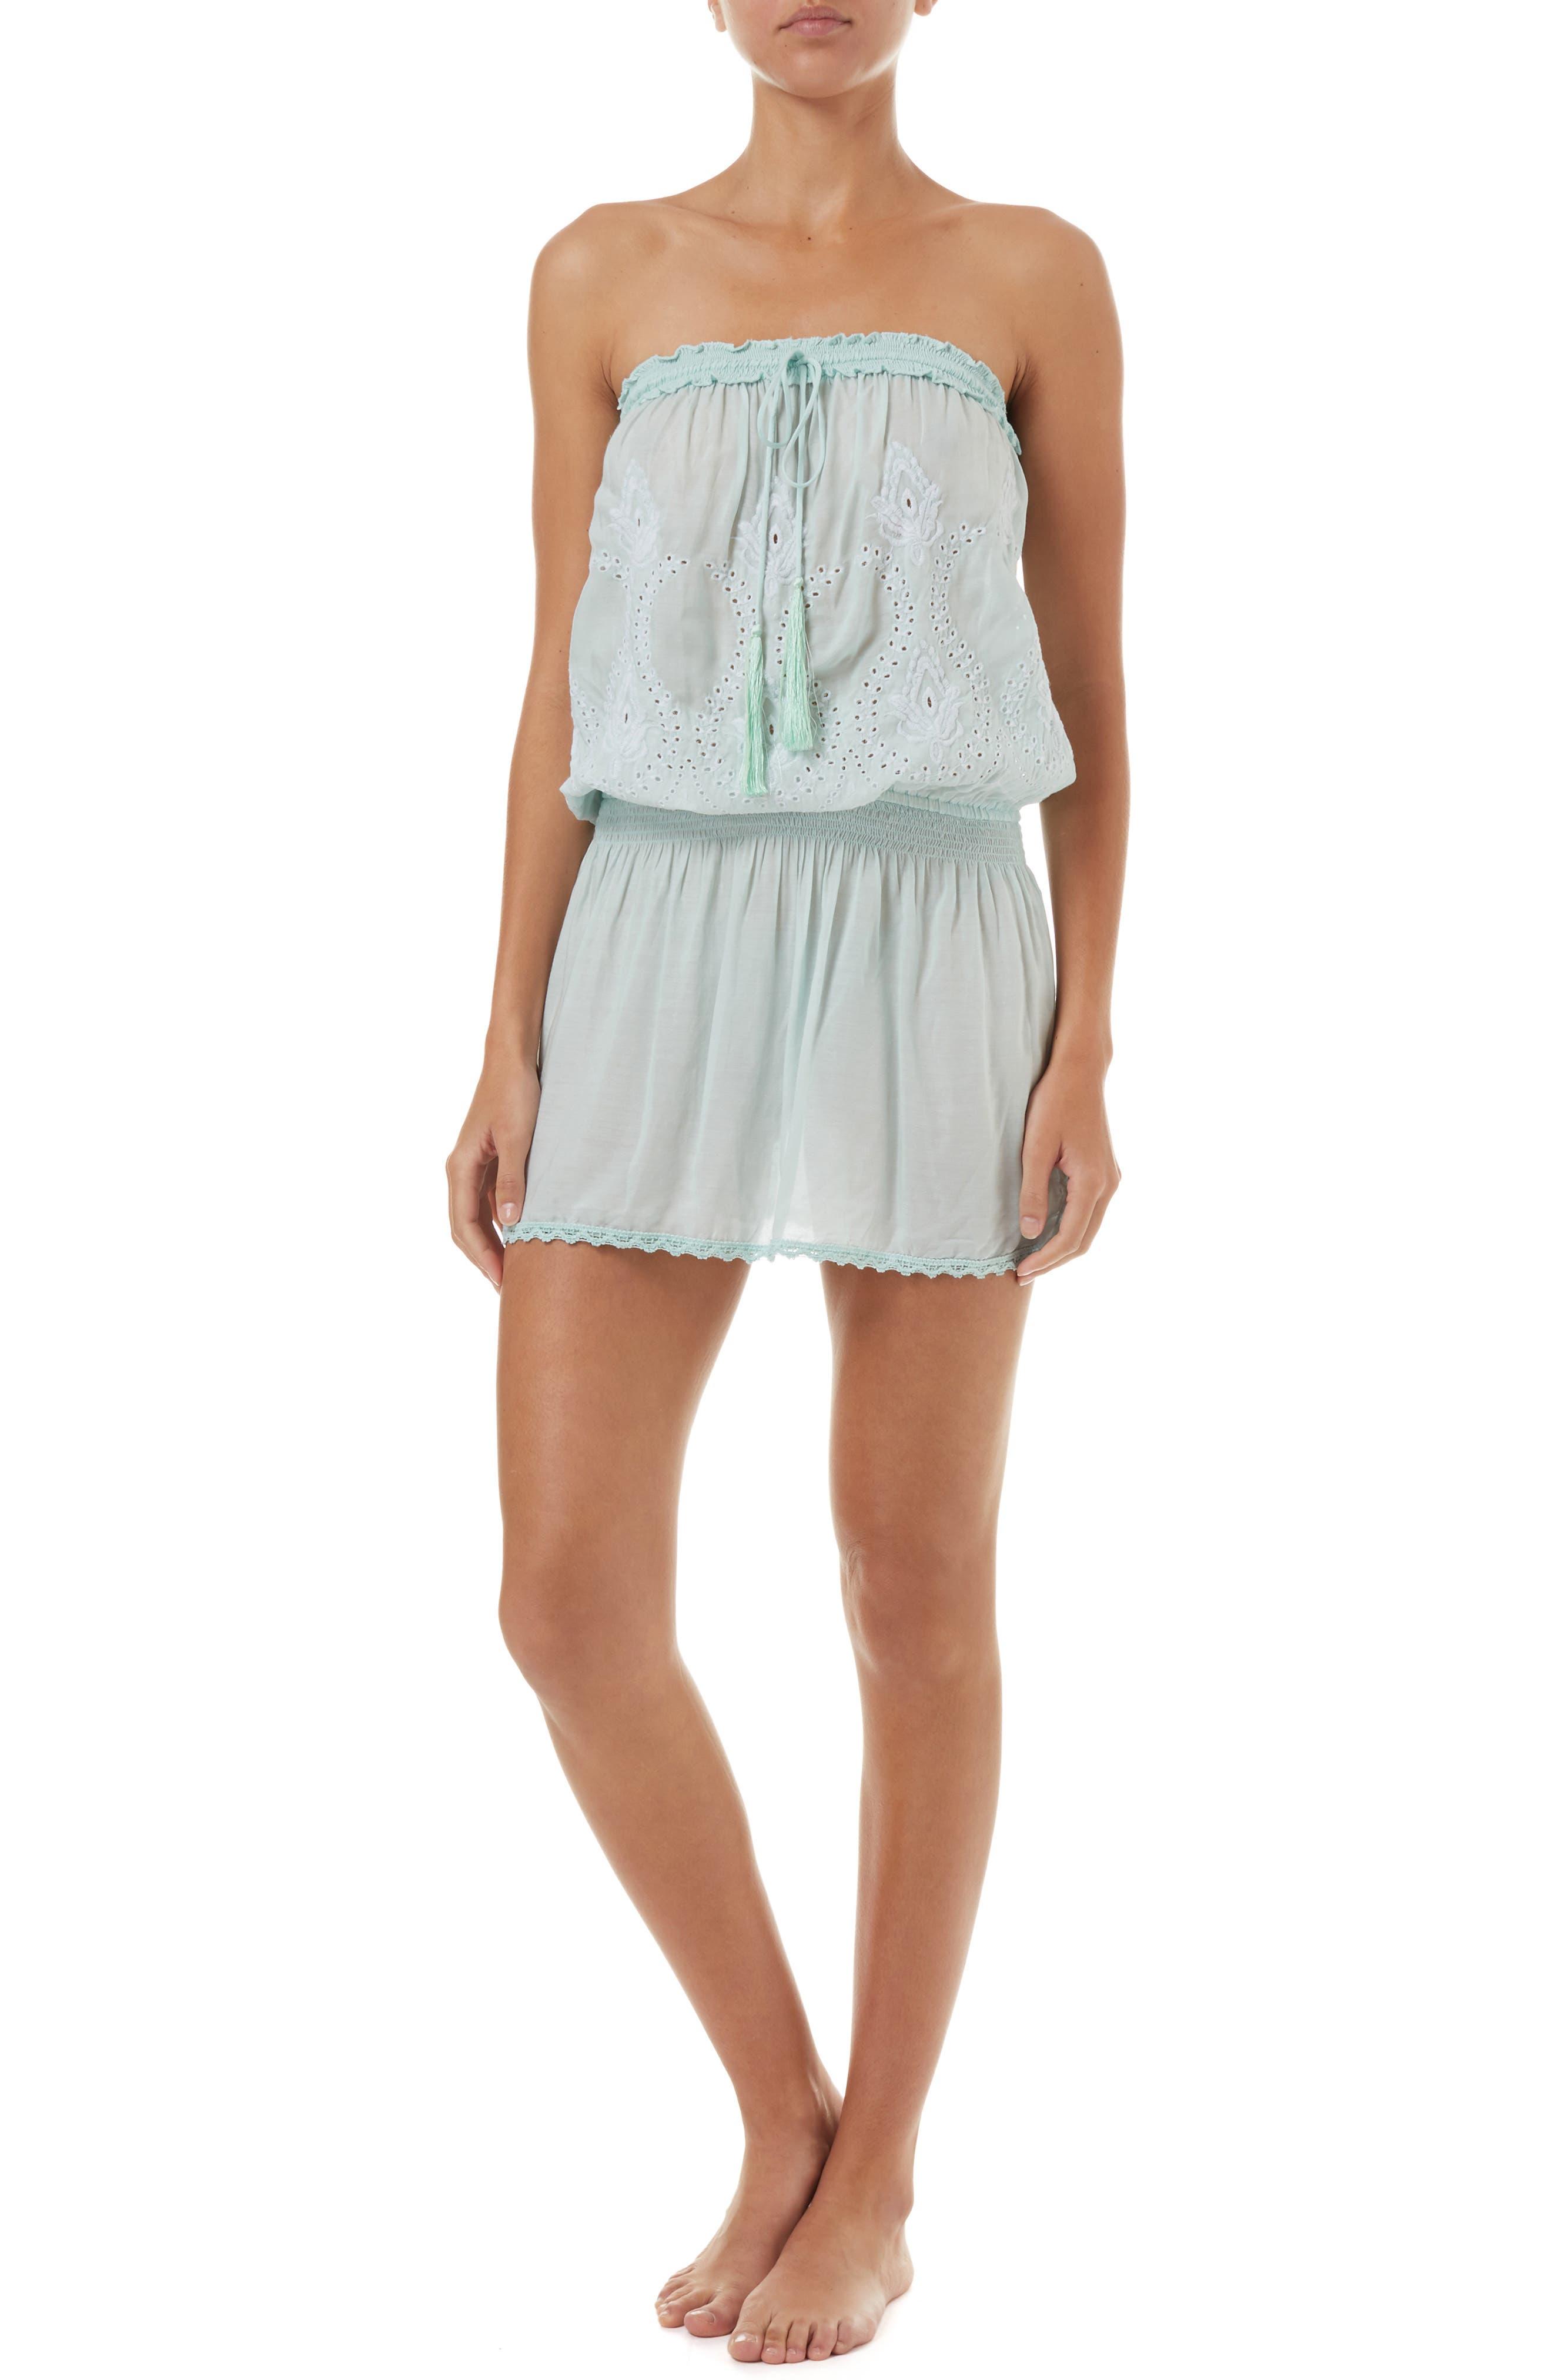 MELISSA ODABASH Fruley Cover-Up Dress, Main, color, MINT/ WHITE